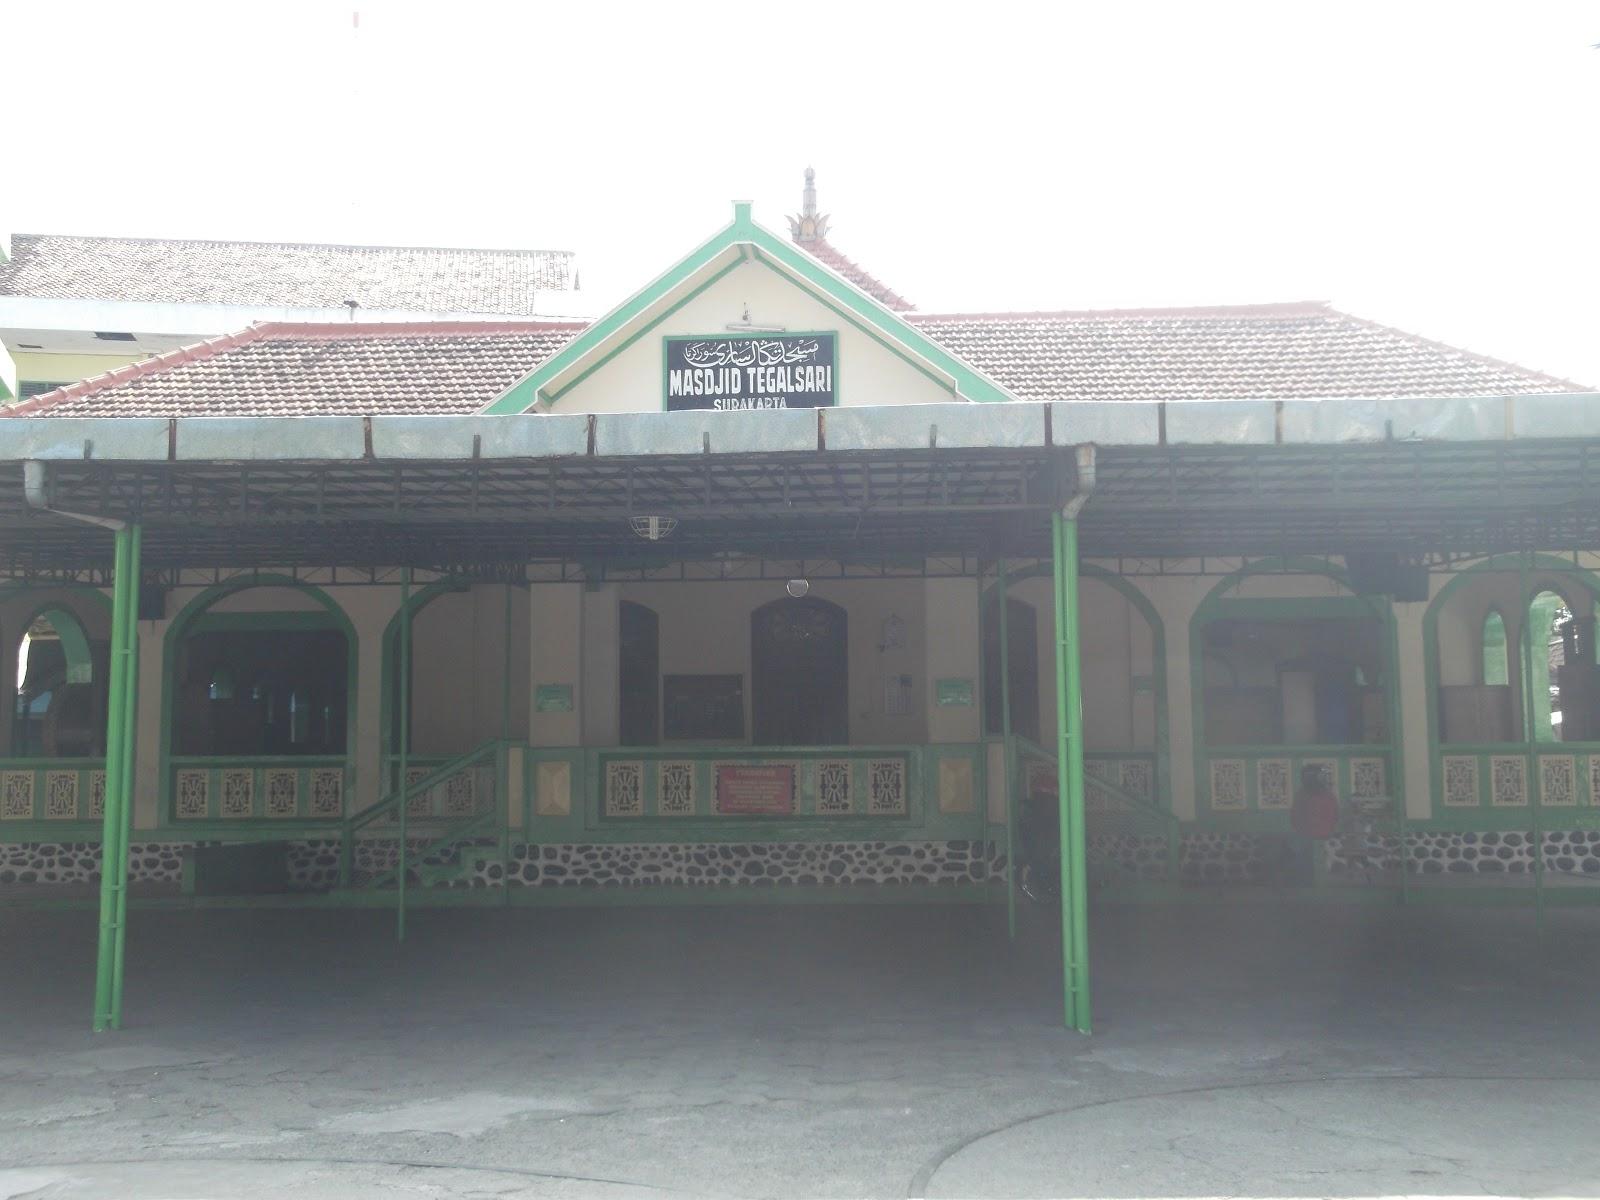 Masjid Tegalsari Surakarta Kekunaan Kekayaan Dimiliki Ahmad Shofawi Membantu Berbagai